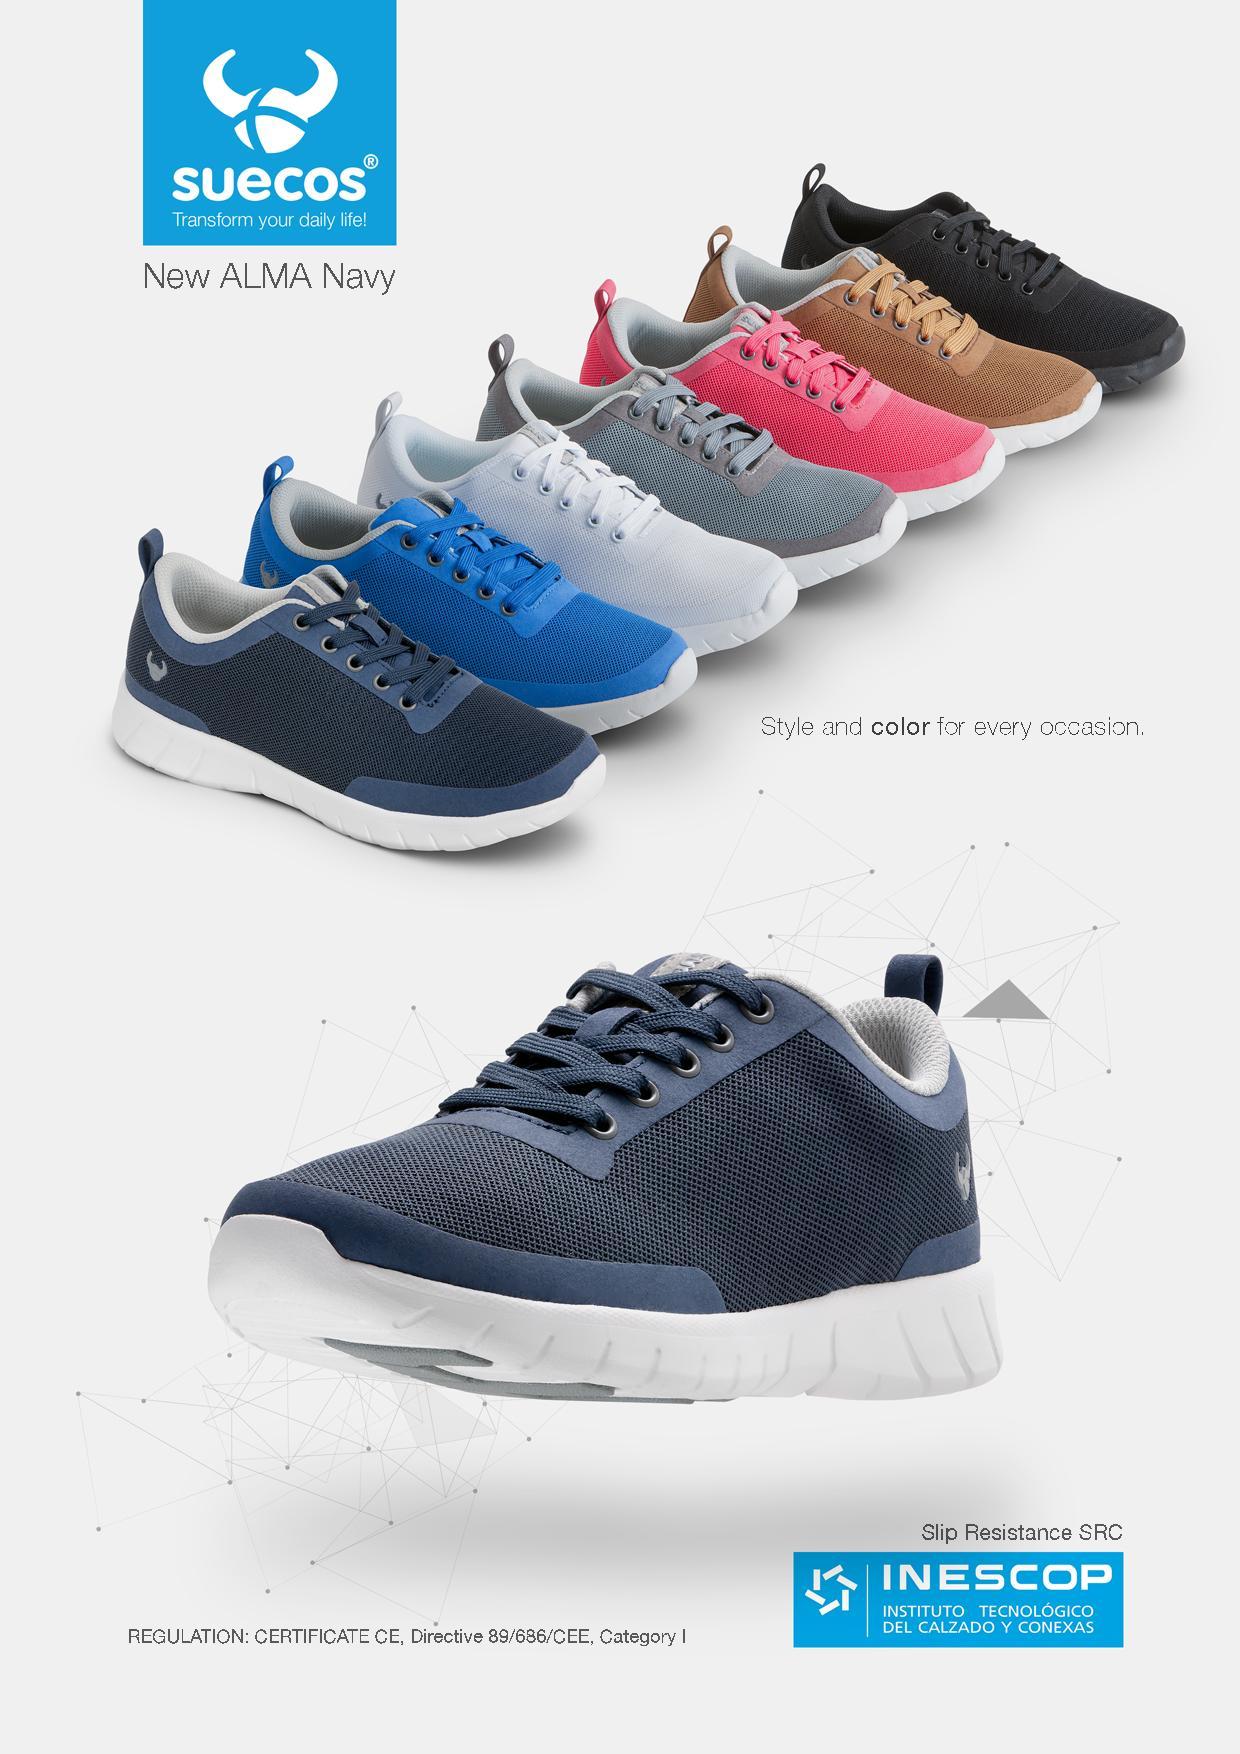 calzature suecos